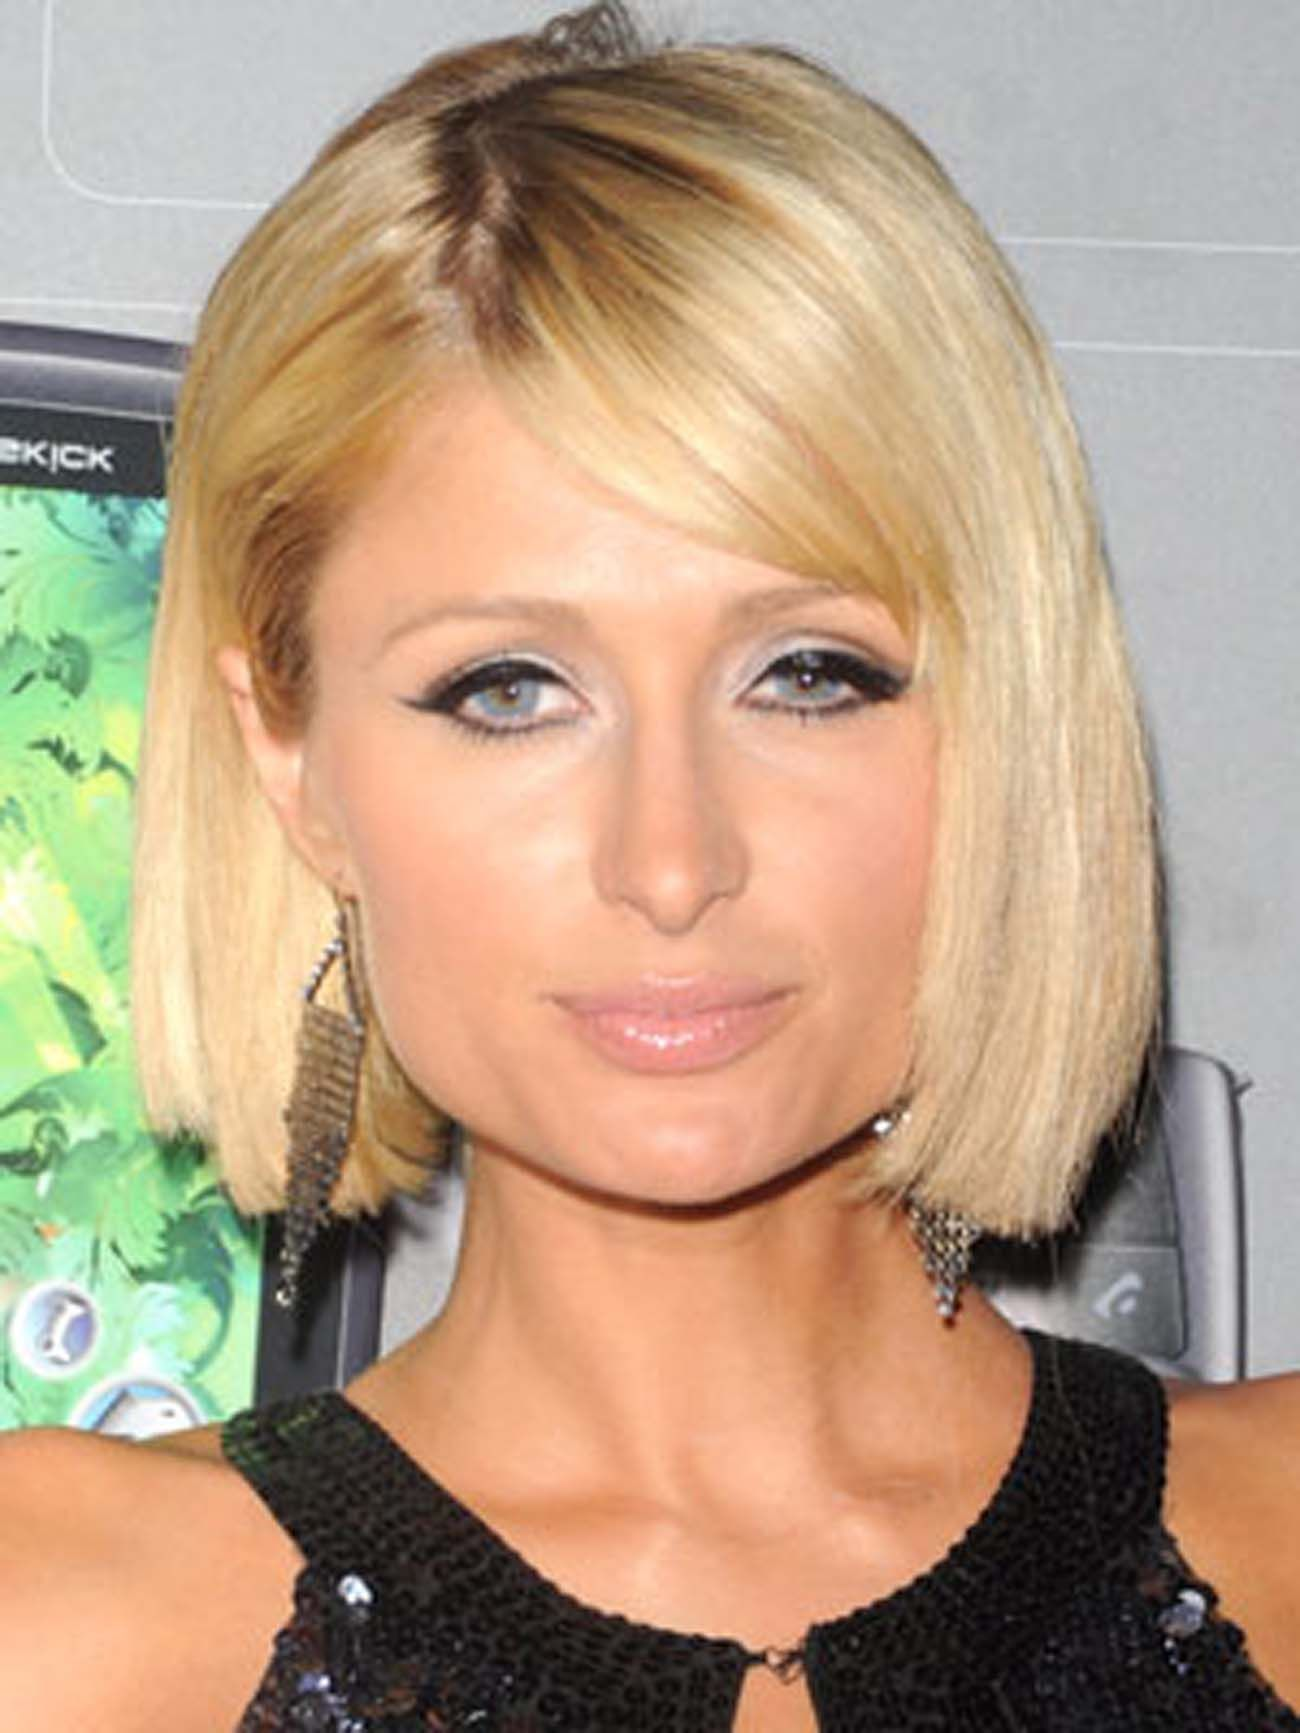 Paris Hilton Haircut: Blonde Bob